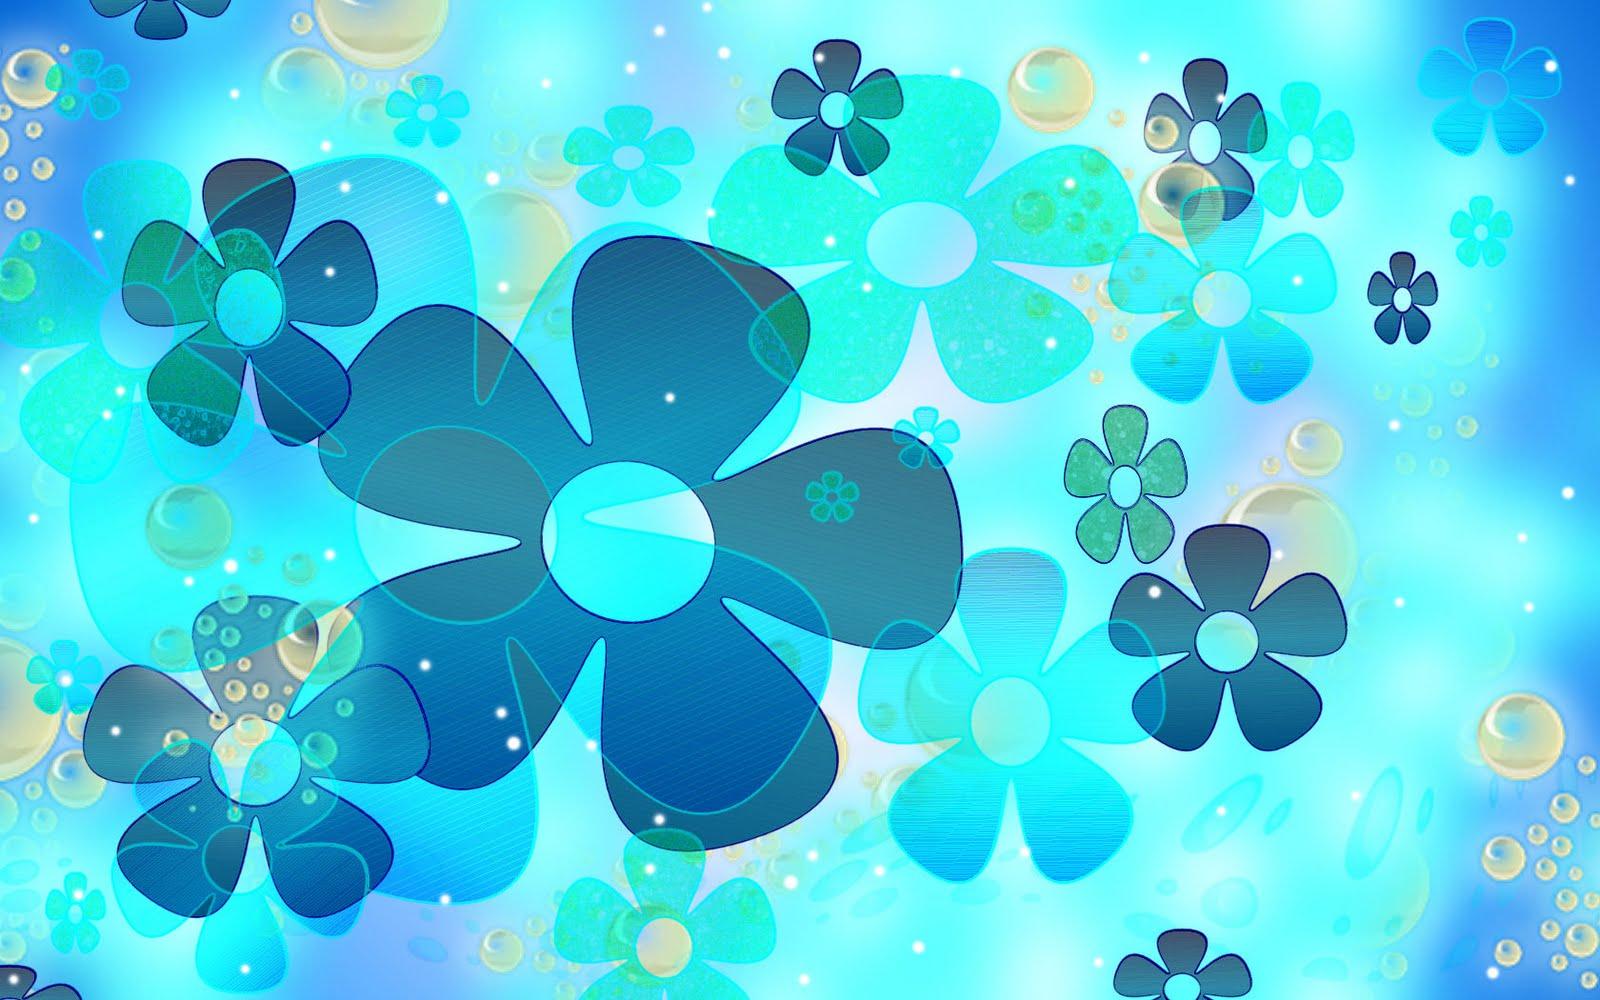 Vector Floral d Seamless rk Blue Background Wallpaper